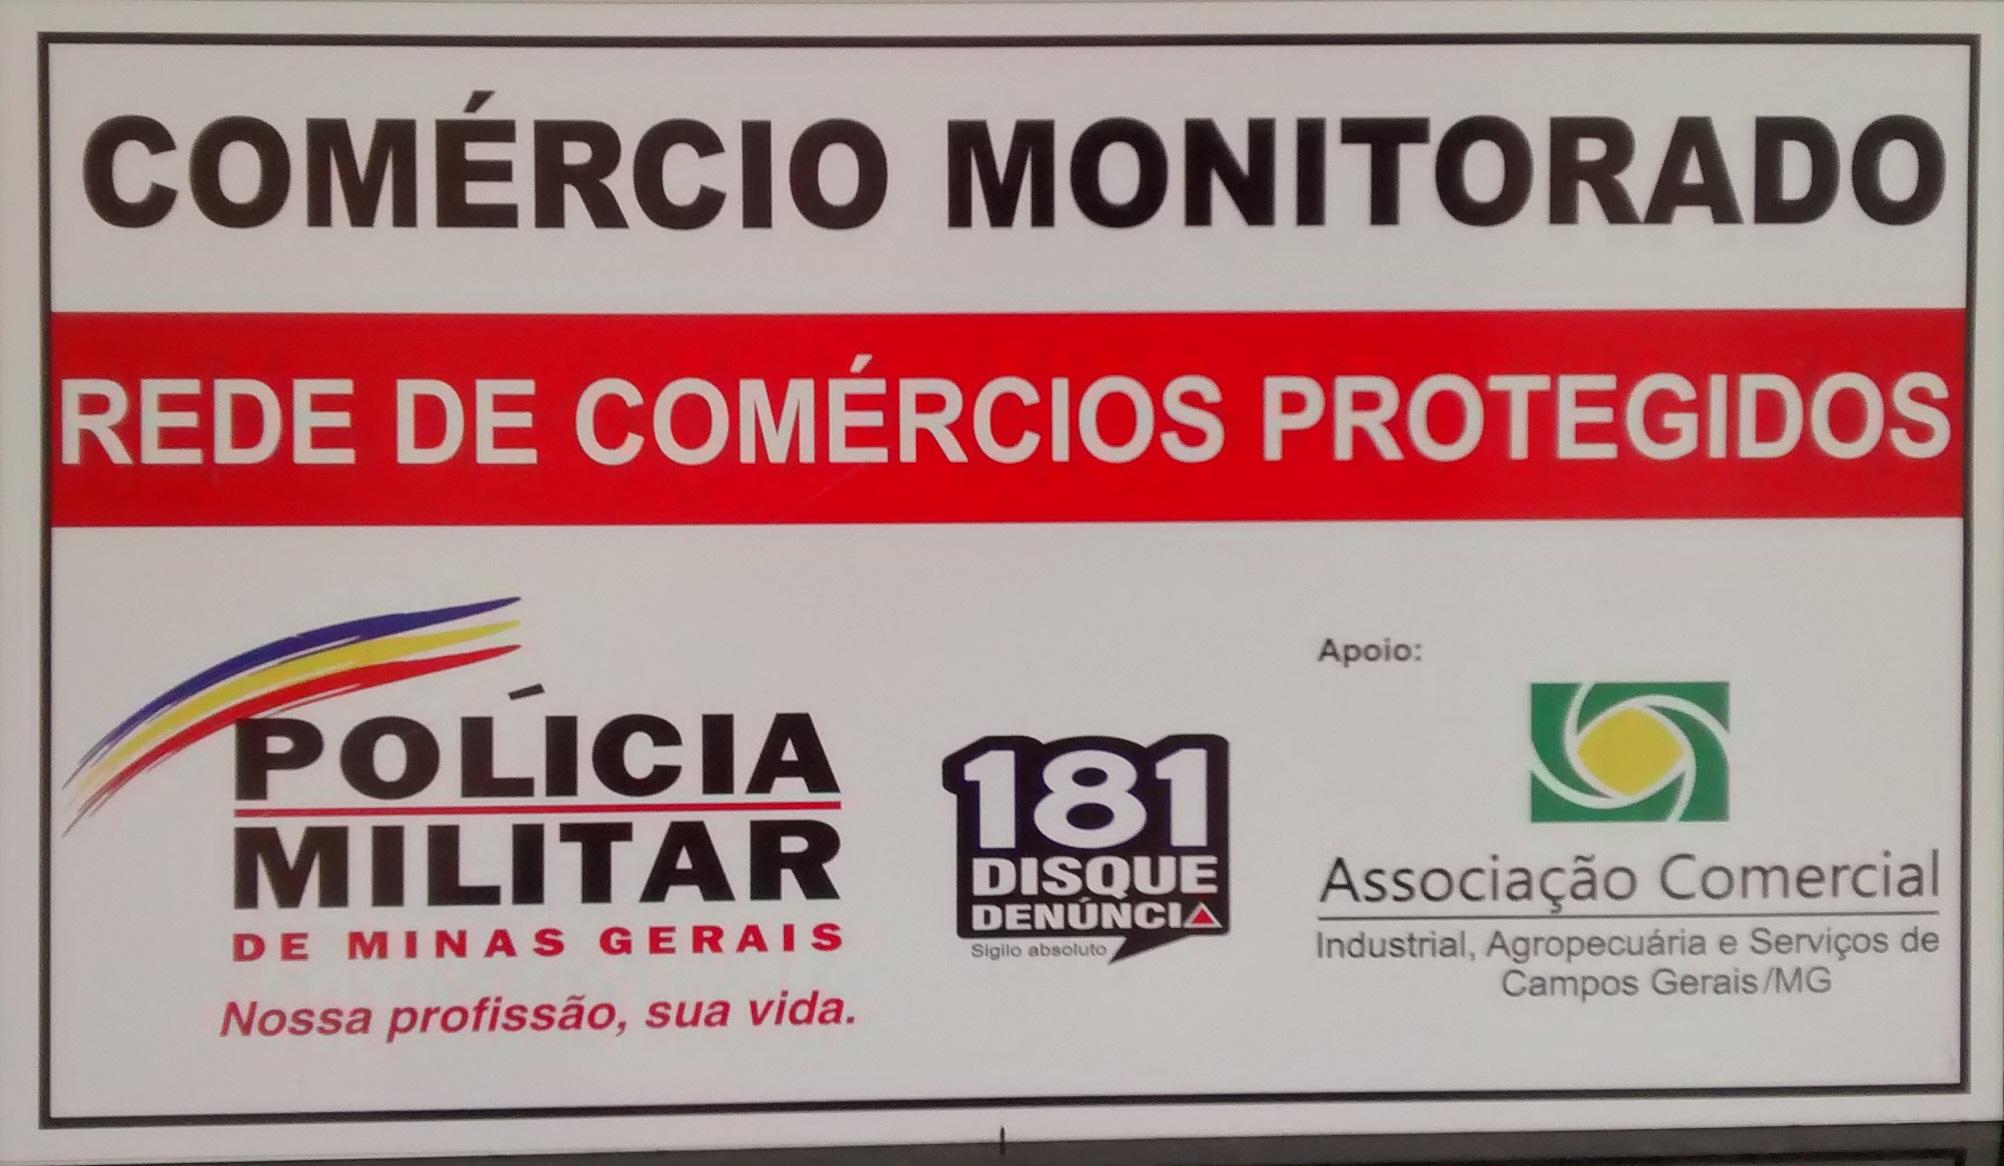 REDE DE COMÉRCIOS PROTEGIDOS